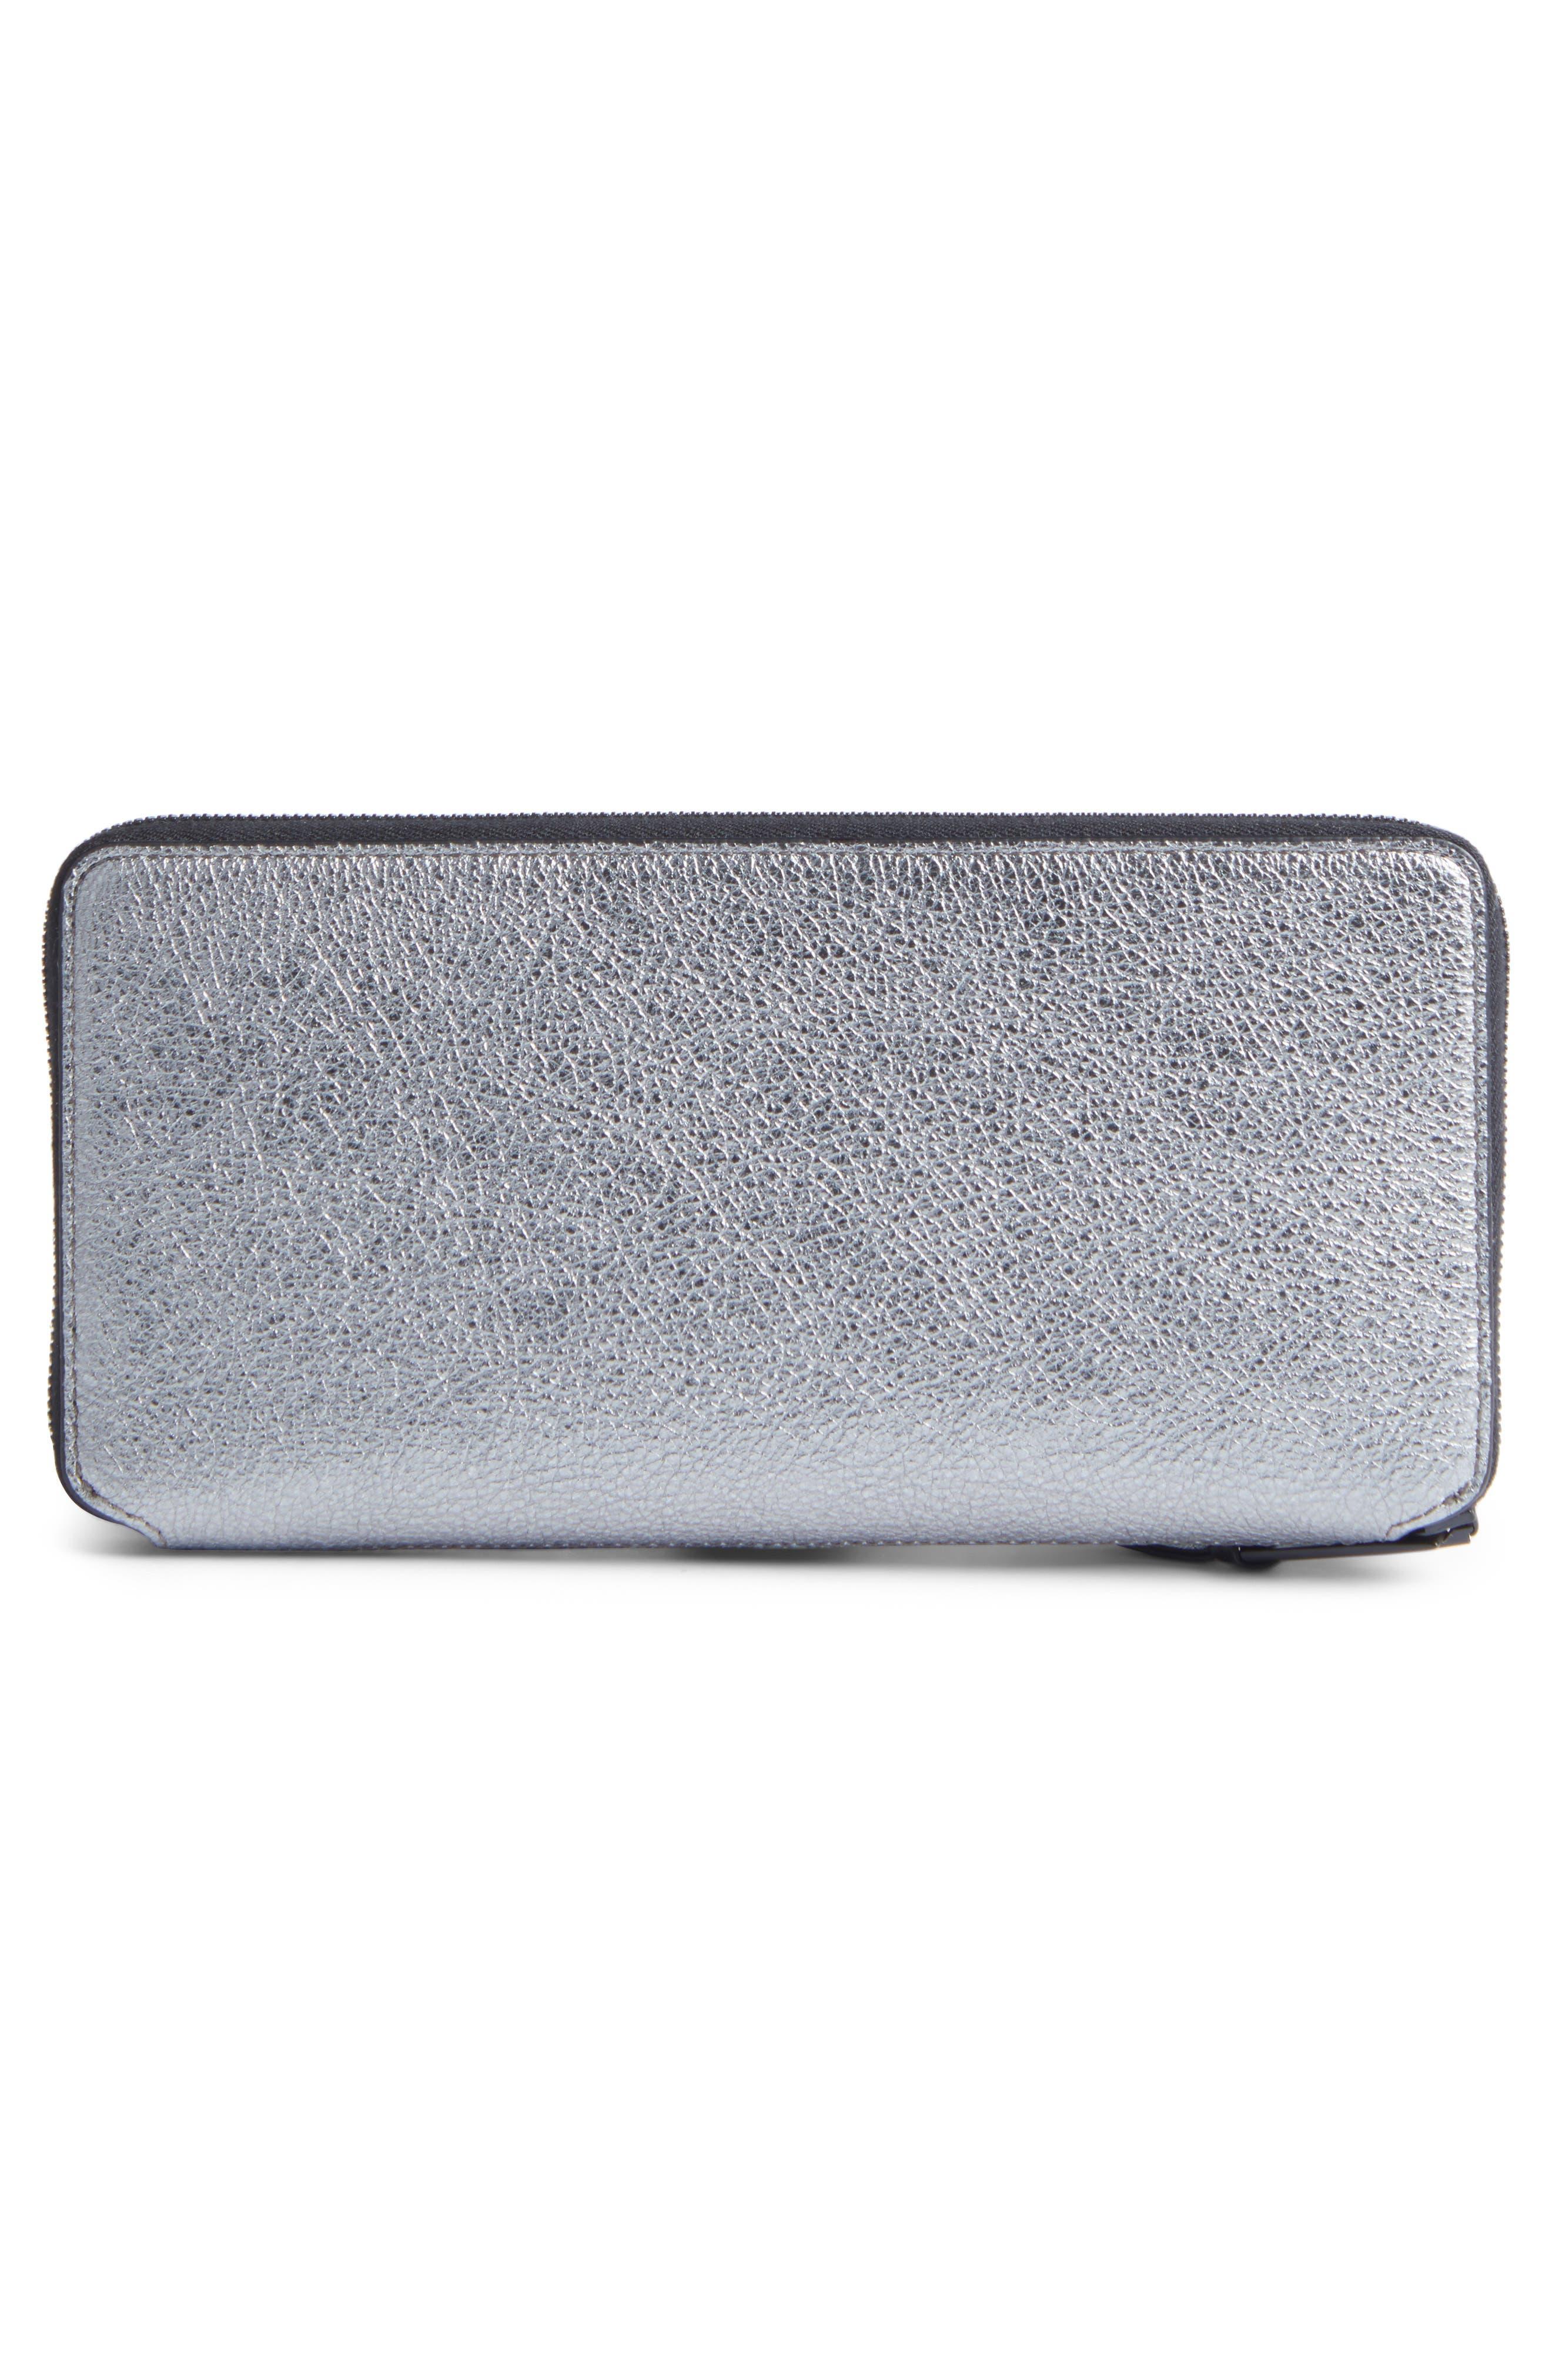 Metallic Leather Zip-Around Wallet,                             Alternate thumbnail 3, color,                             Gunmetal